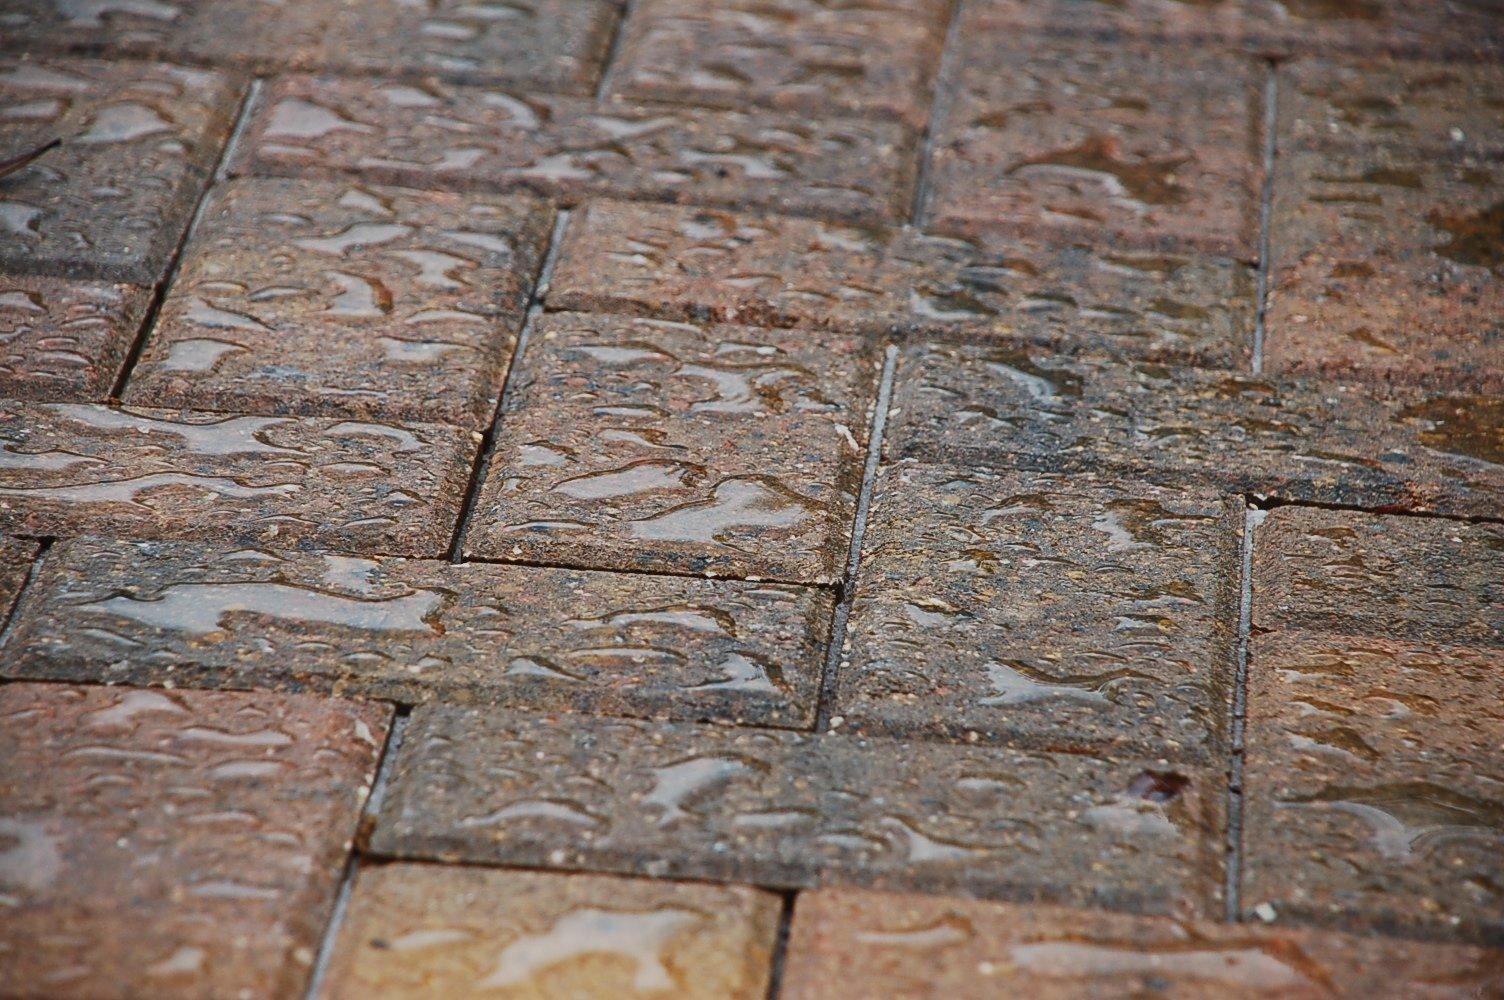 Rainguard Advanced Waterproofer Concentrate (Each 6 oz Pod Makes 1 gal) for Masonry, Concrete, Brick, Wood, Stone Sealer for Driveways, Decks, Patios, Walkways, Pavers, Fences (Case of 12)